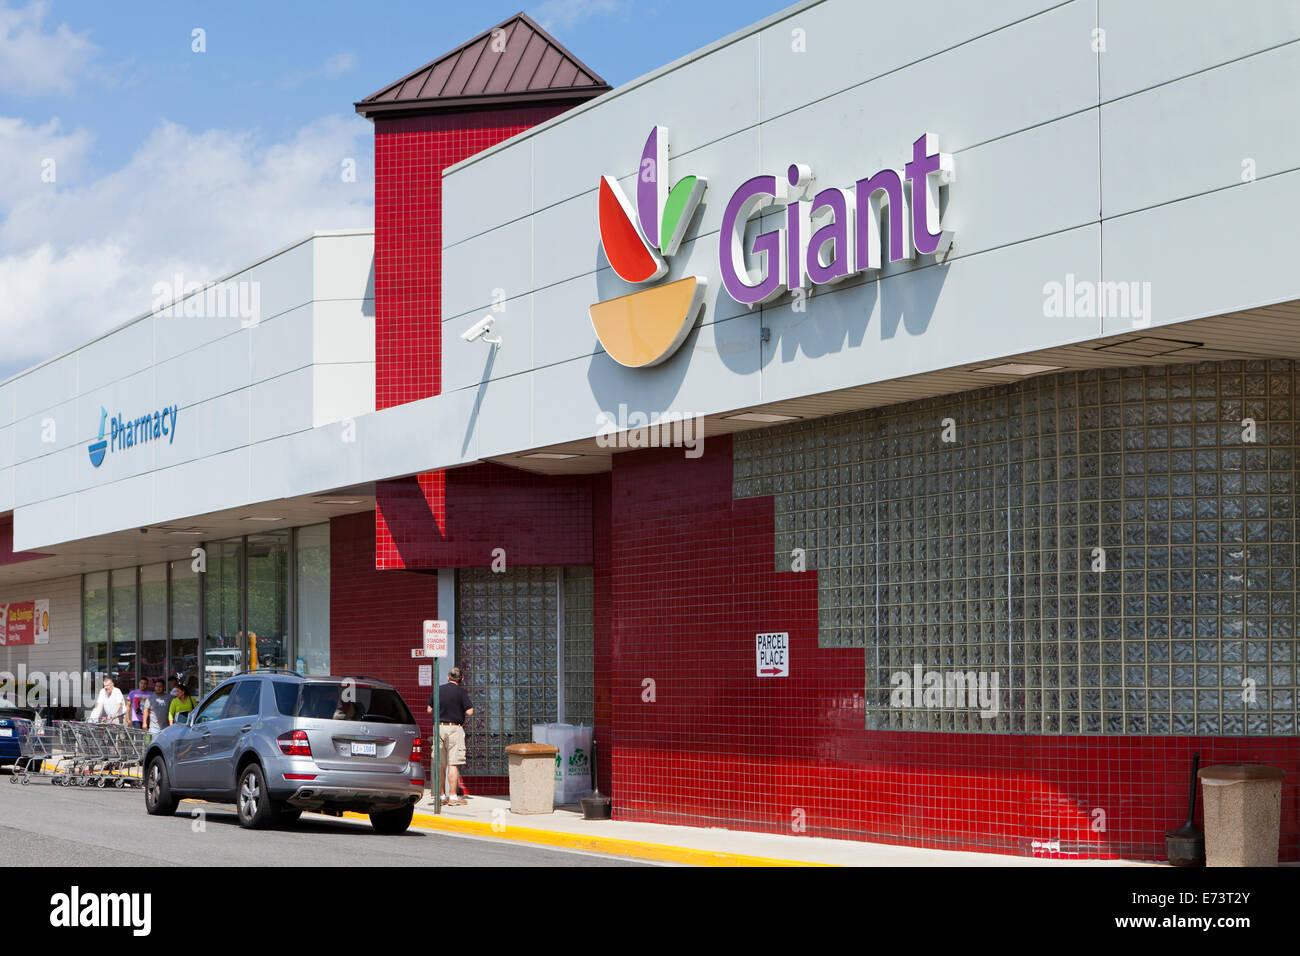 Giant Market Stock Photos Giant Market Stock Images Alamy